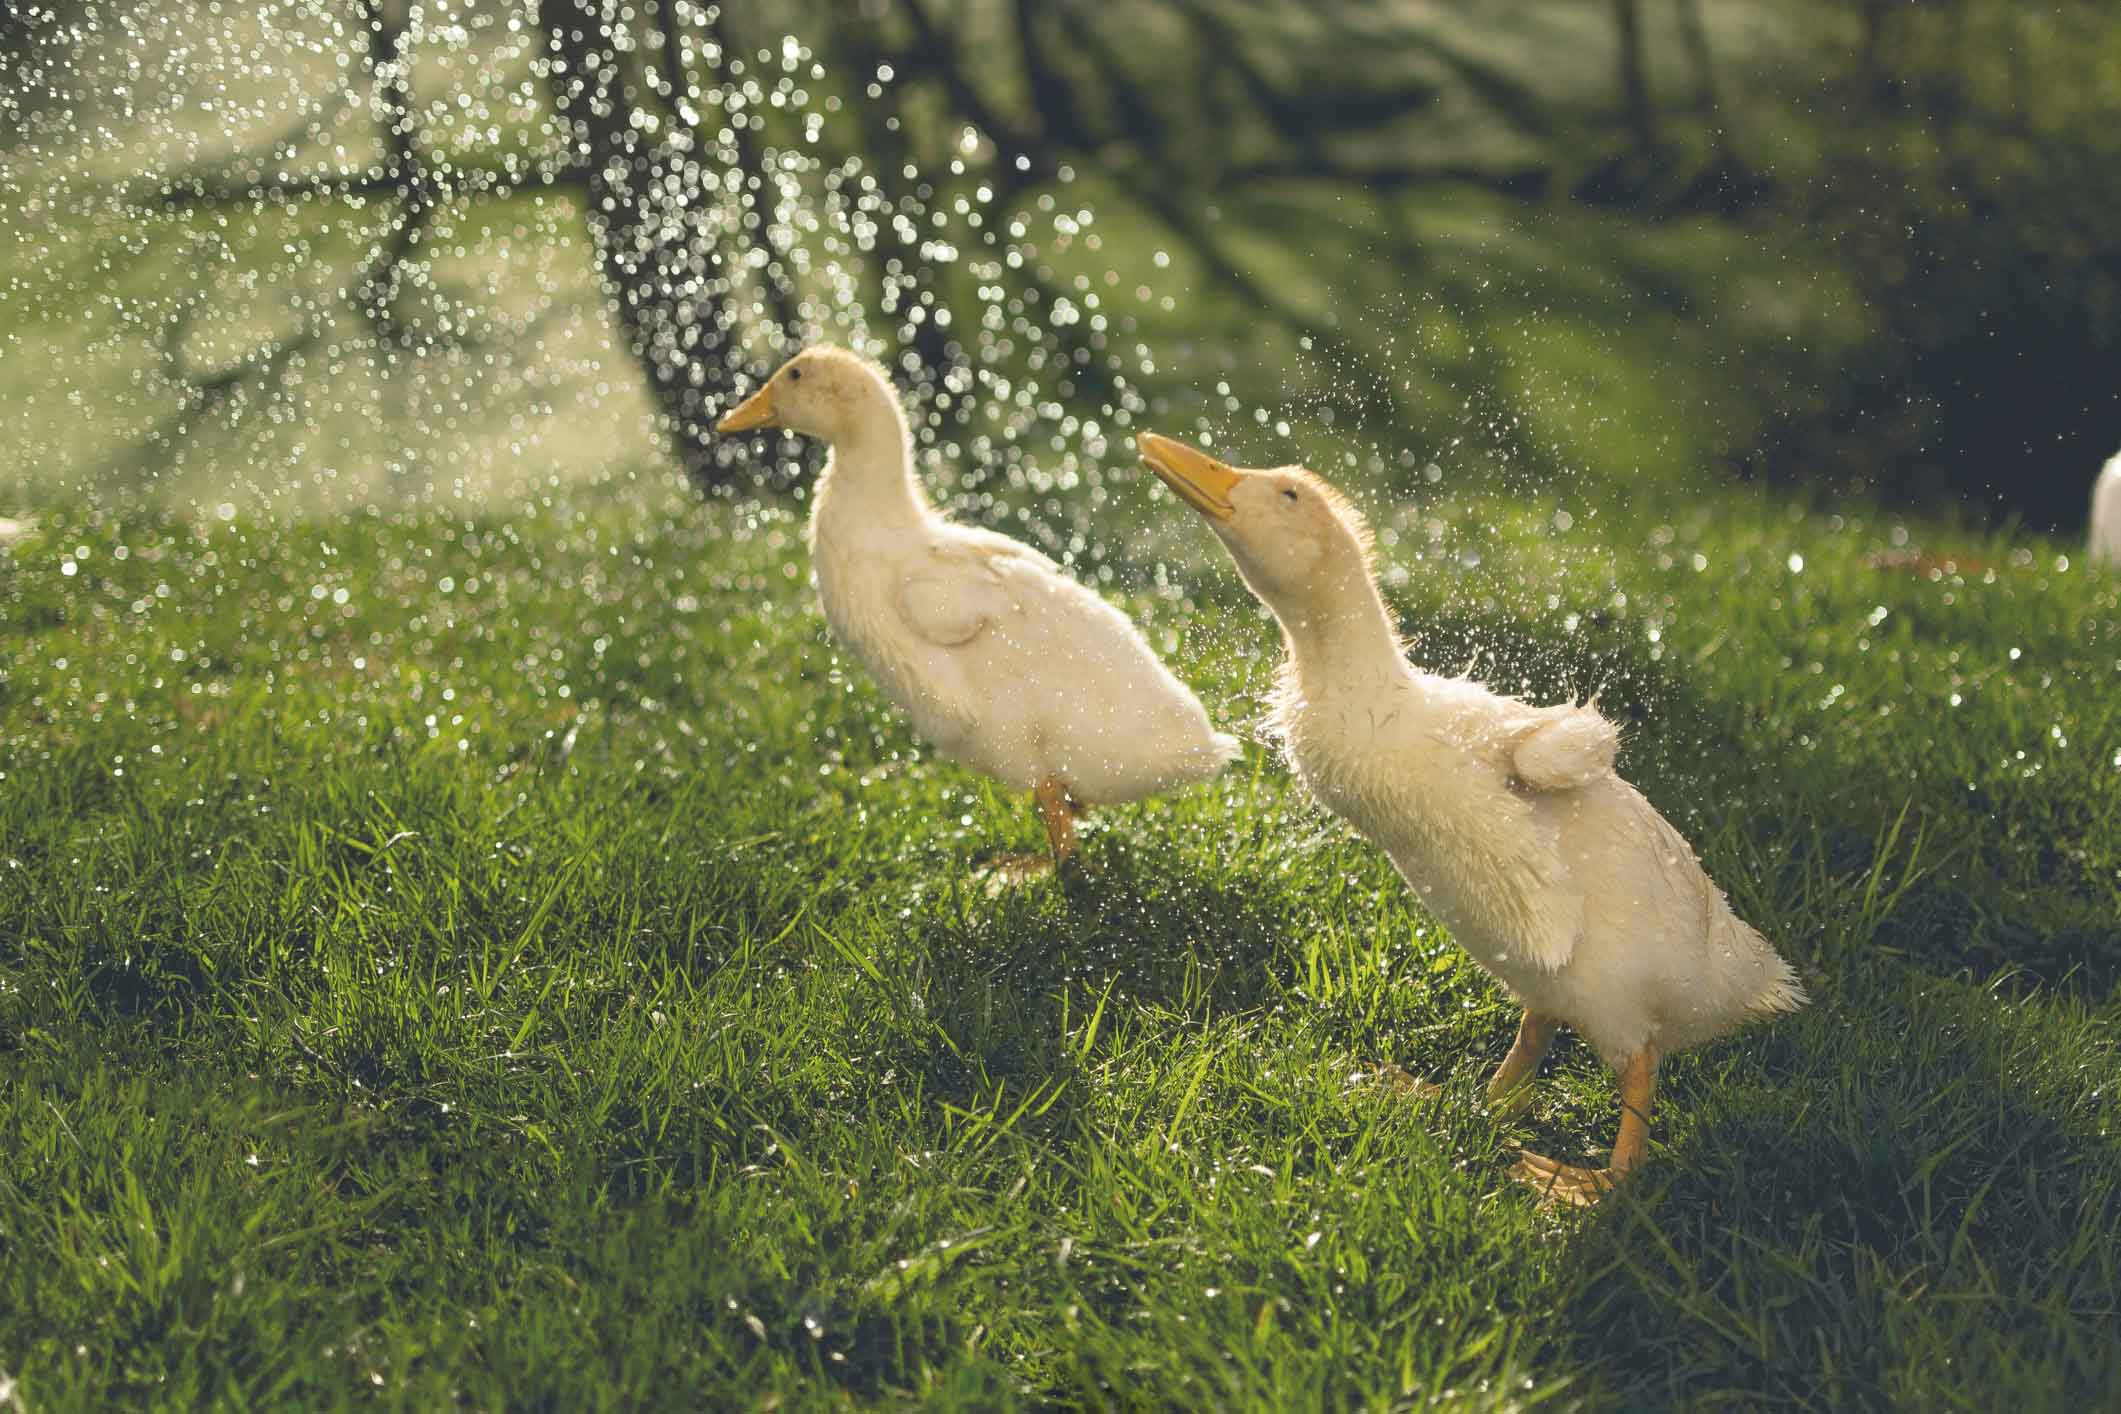 Ducks_0001